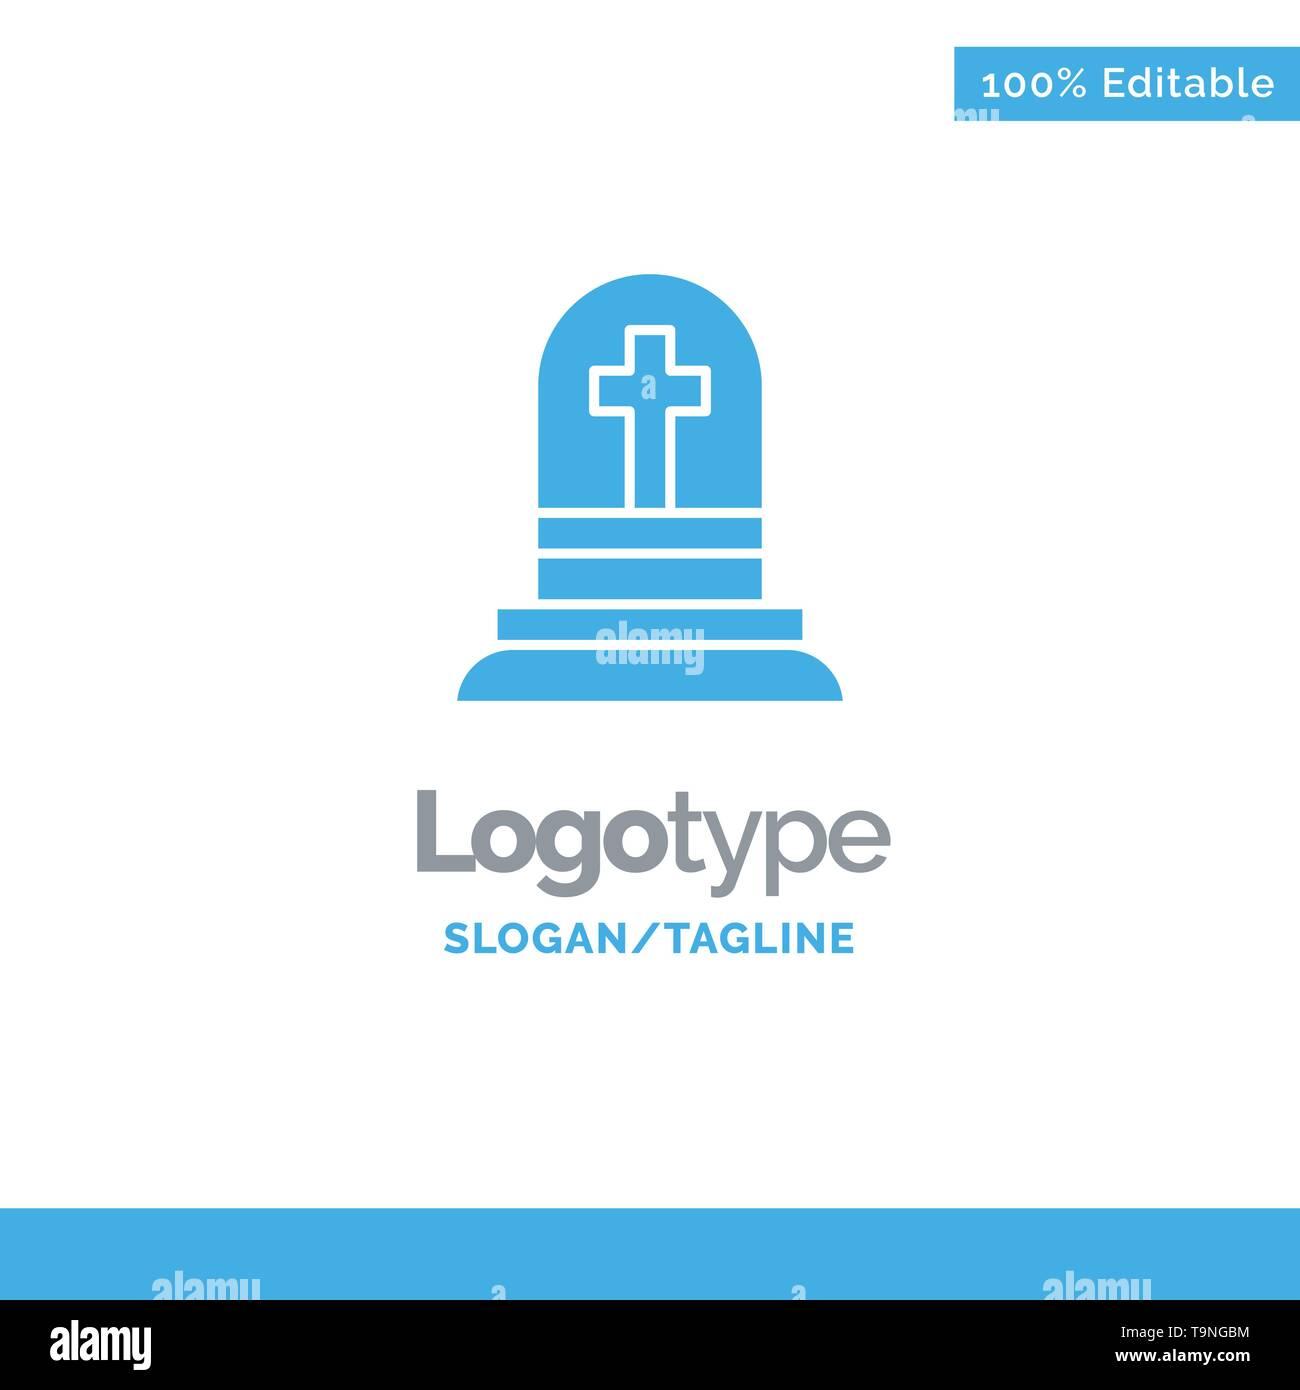 Death, Grave, Gravestone, Rip Blue Solid Logo Template. Place for Tagline - Stock Image